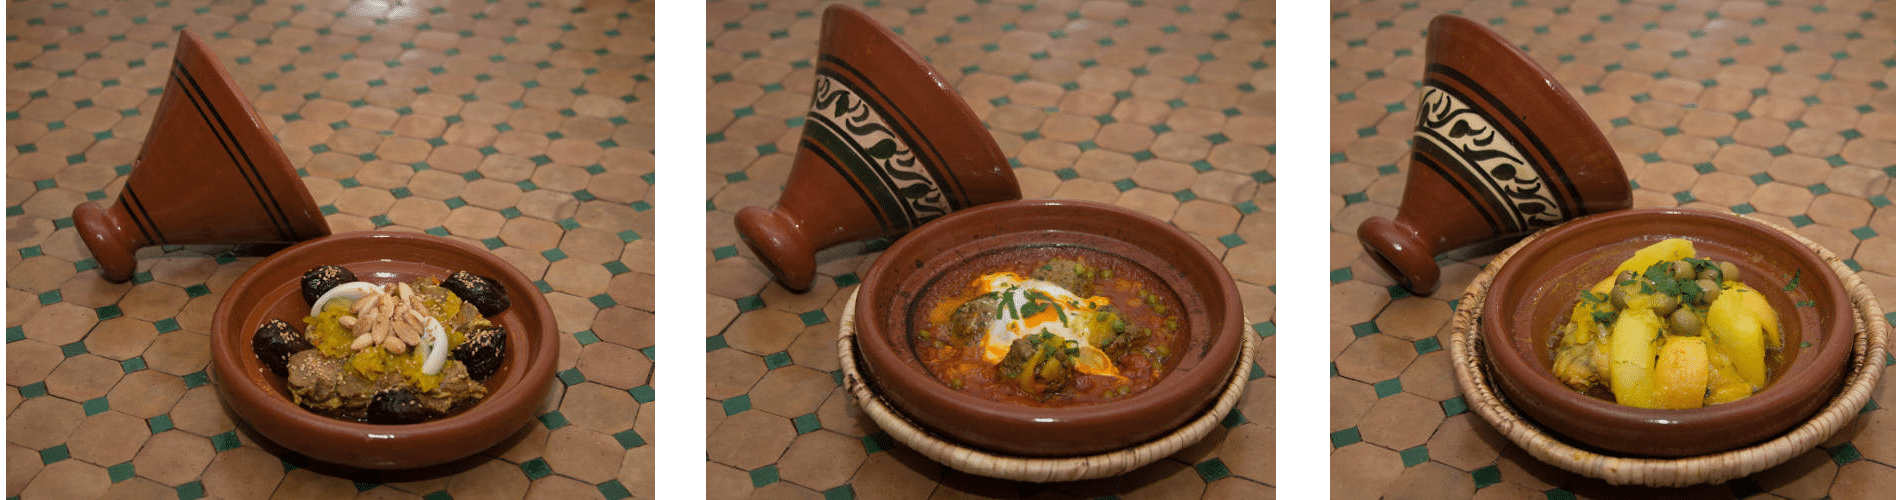 Restaurant-marocain-couscous-Seine-et-Marne-77-tajines